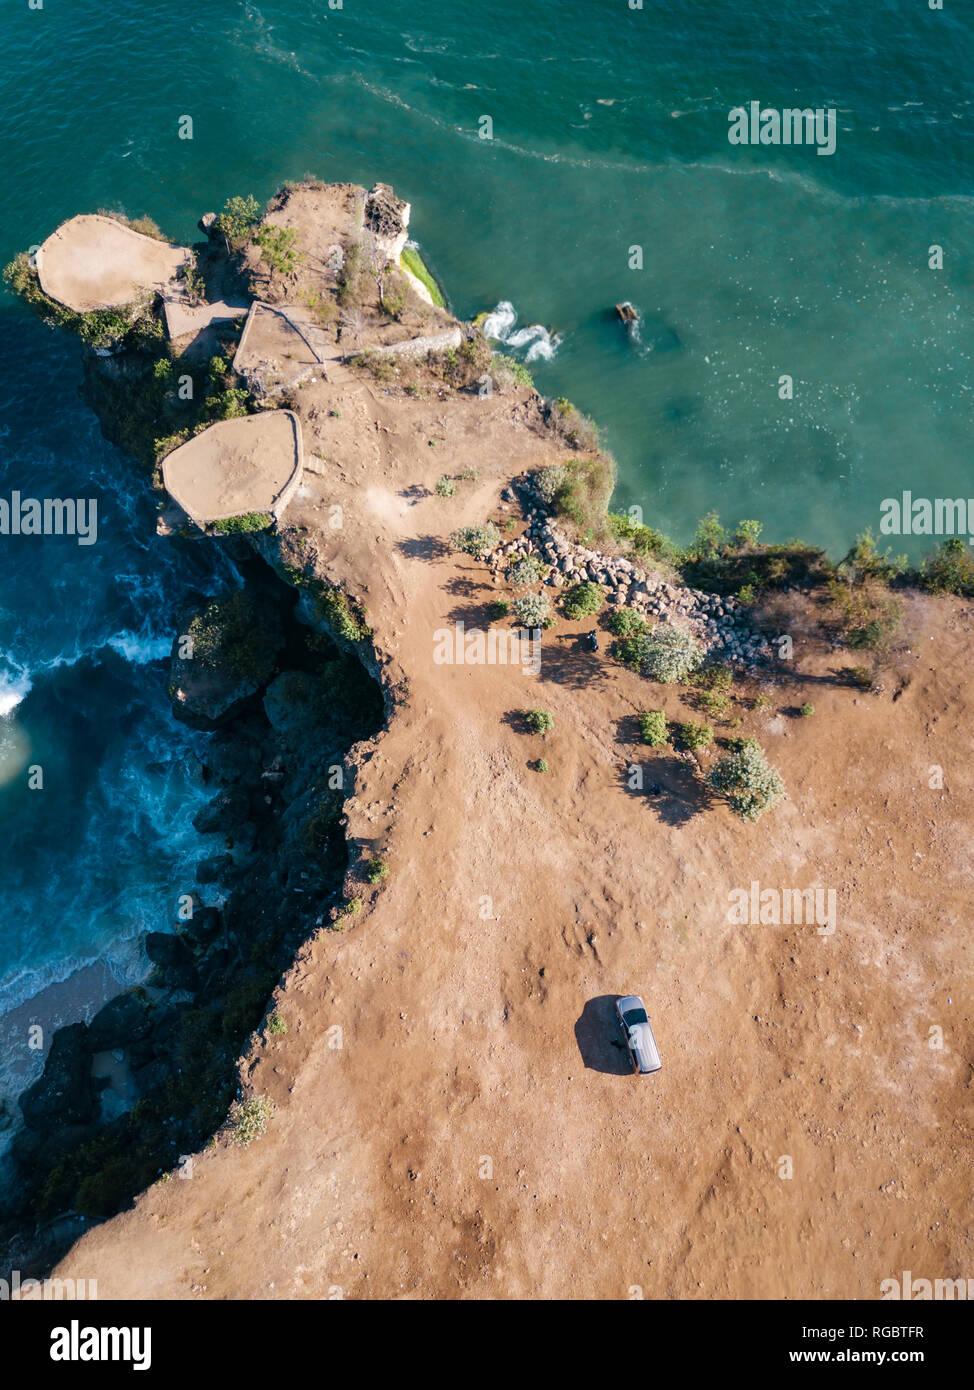 Indonesia, Bali, Aerial view of Balangan beach, viewpoint - Stock Image